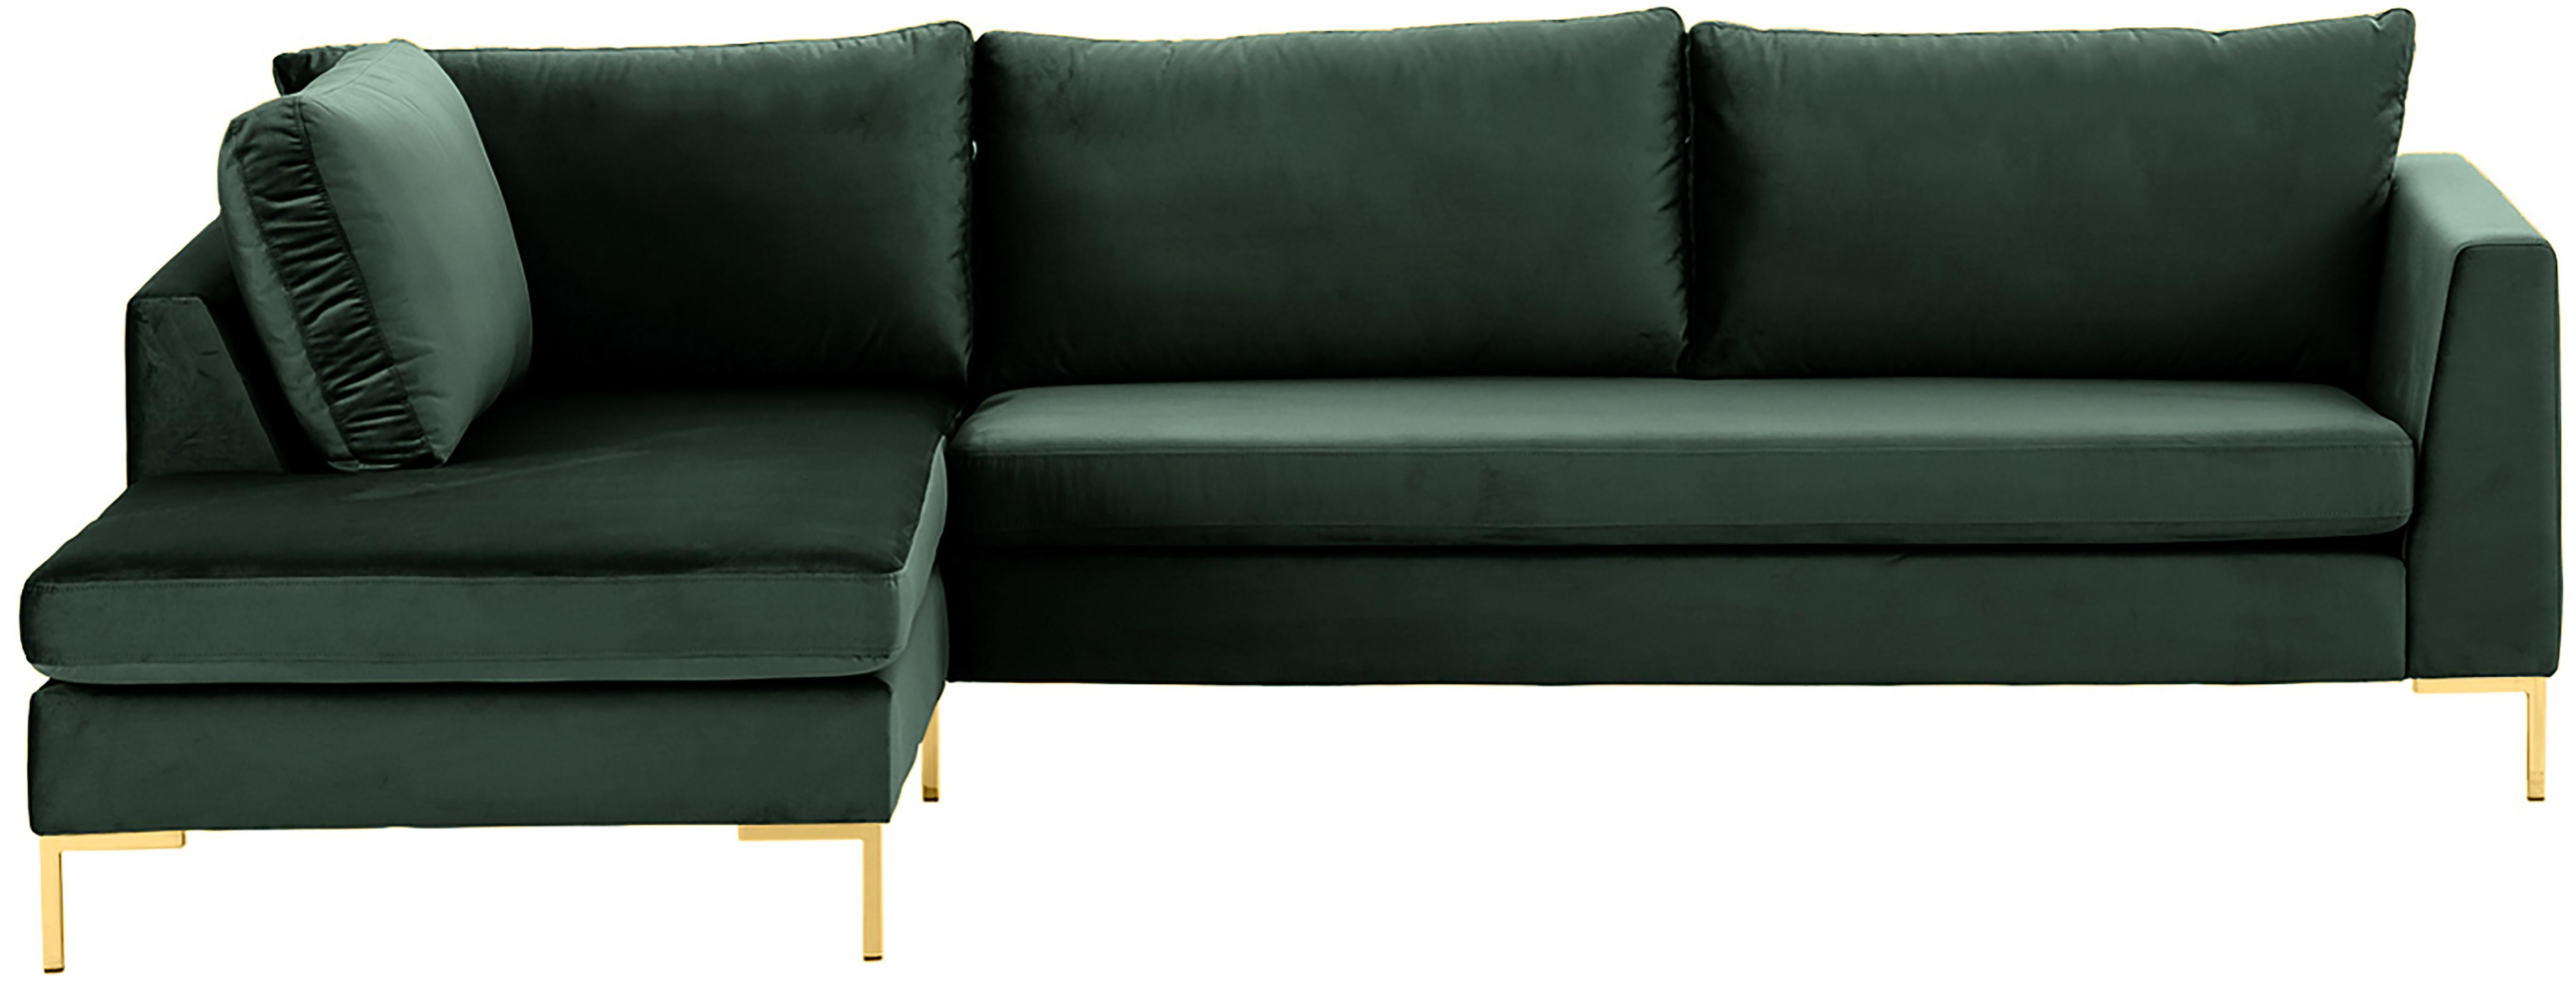 Sofá rinconero de terciopelo Luna, Tapizado: terciopelo (poliéster) Al, Estructura: madera de haya, Patas: metal galvanizado, Terciopelo verde oscuro, dorado, An 280 x F 184 cm